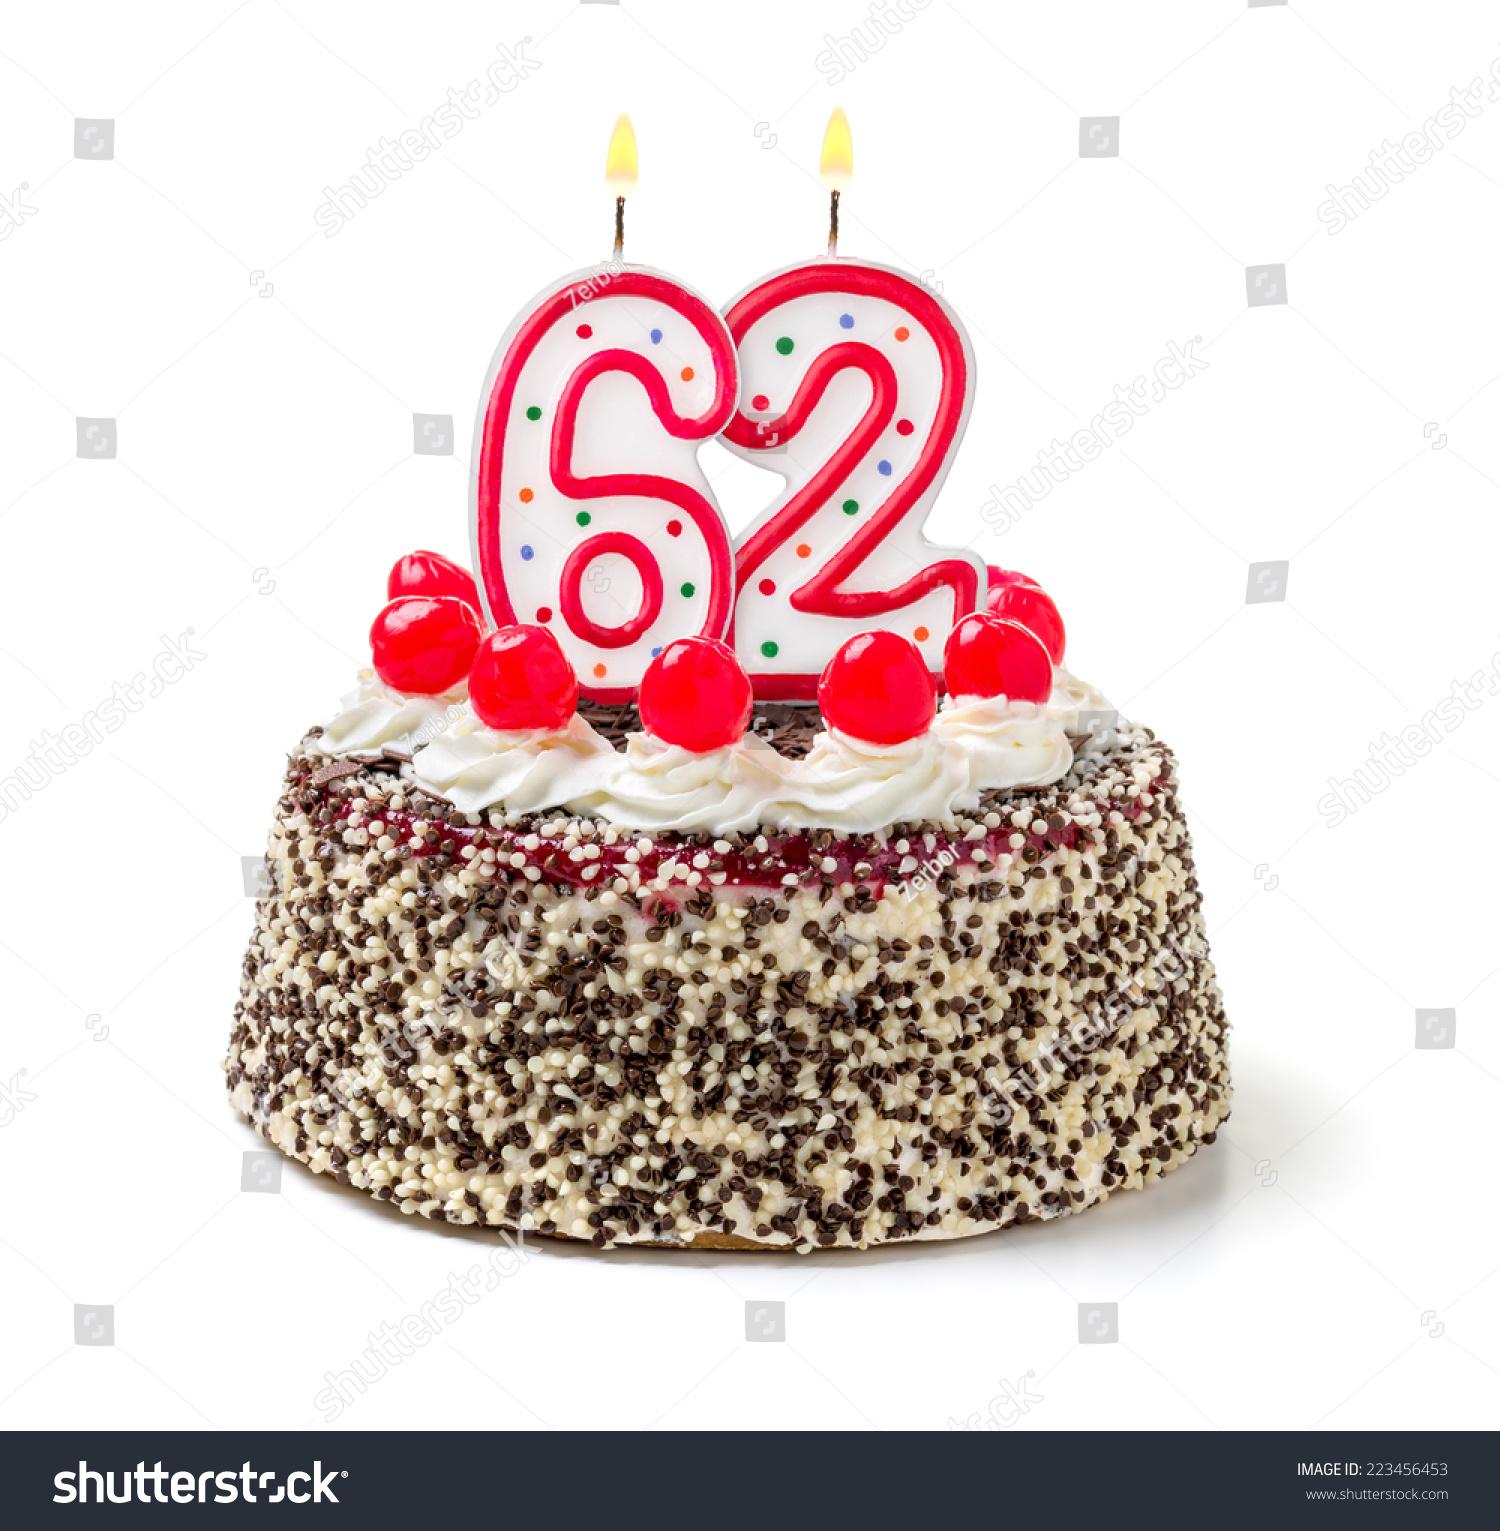 Birthday Cake With Burning Candle Number 62 Stock Photo